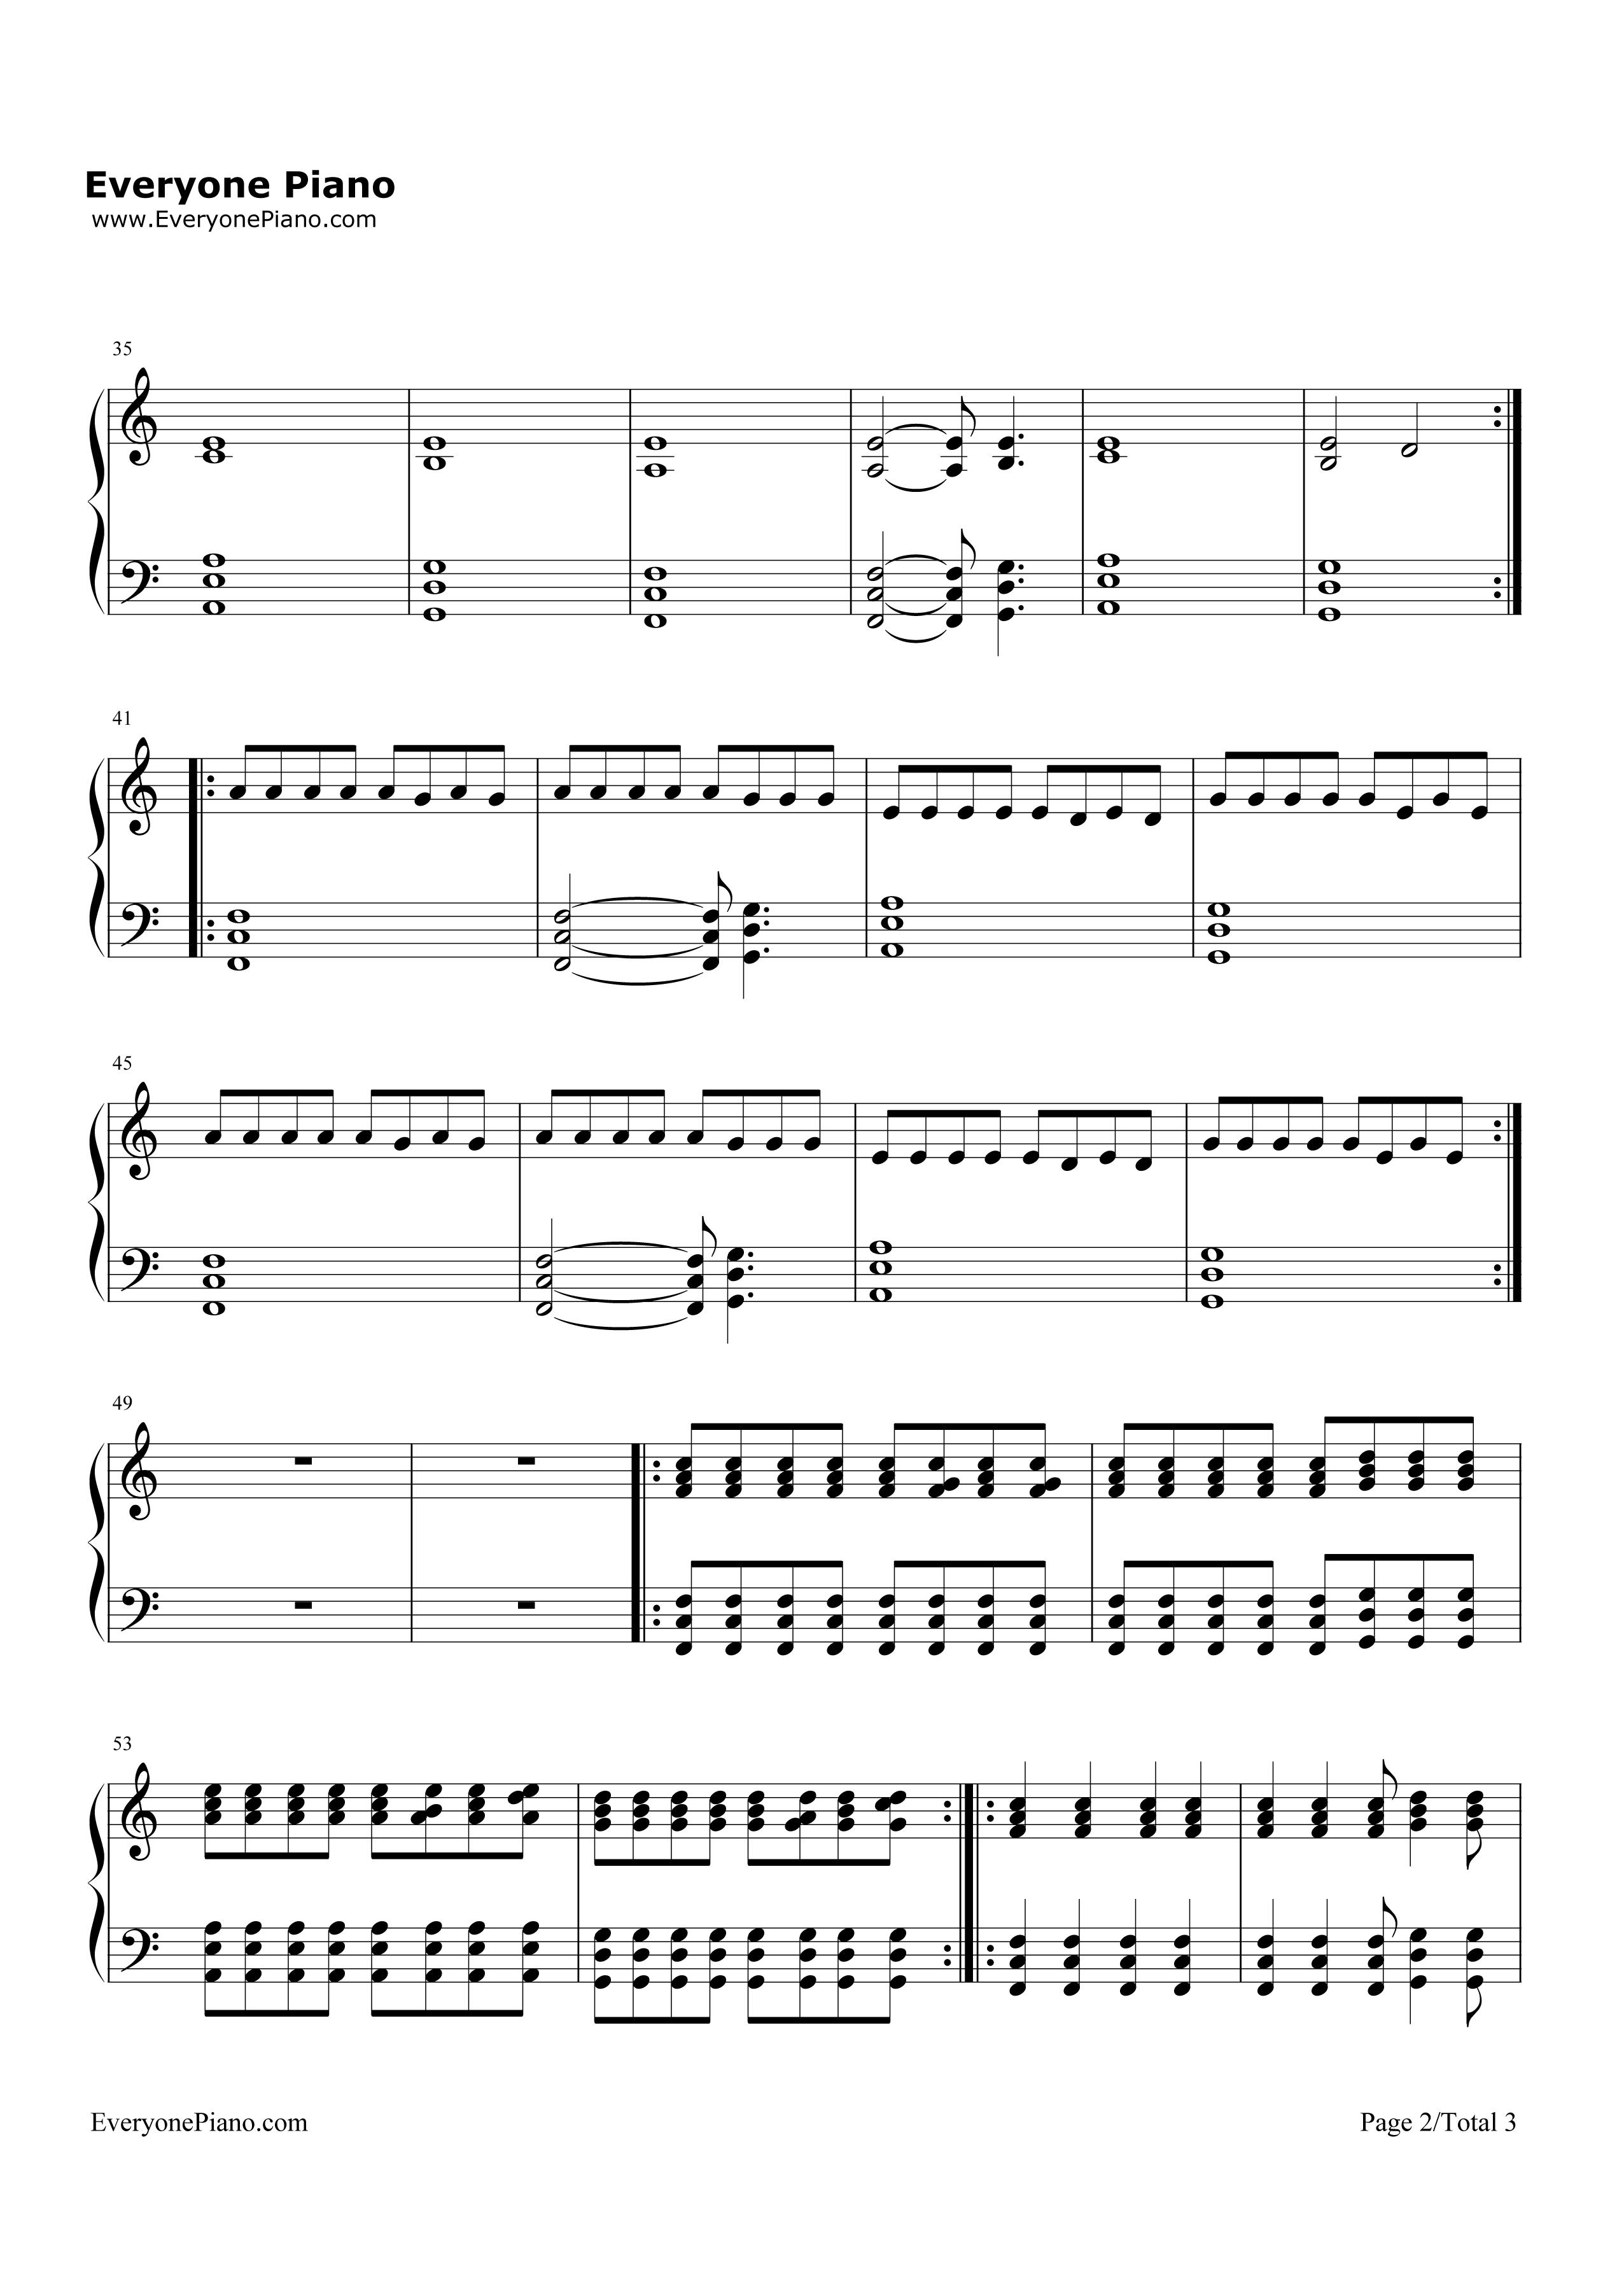 Car Radio-Twenty One Pilots Stave Preview 2-Free Piano Sheet Music u0026 Piano Chords